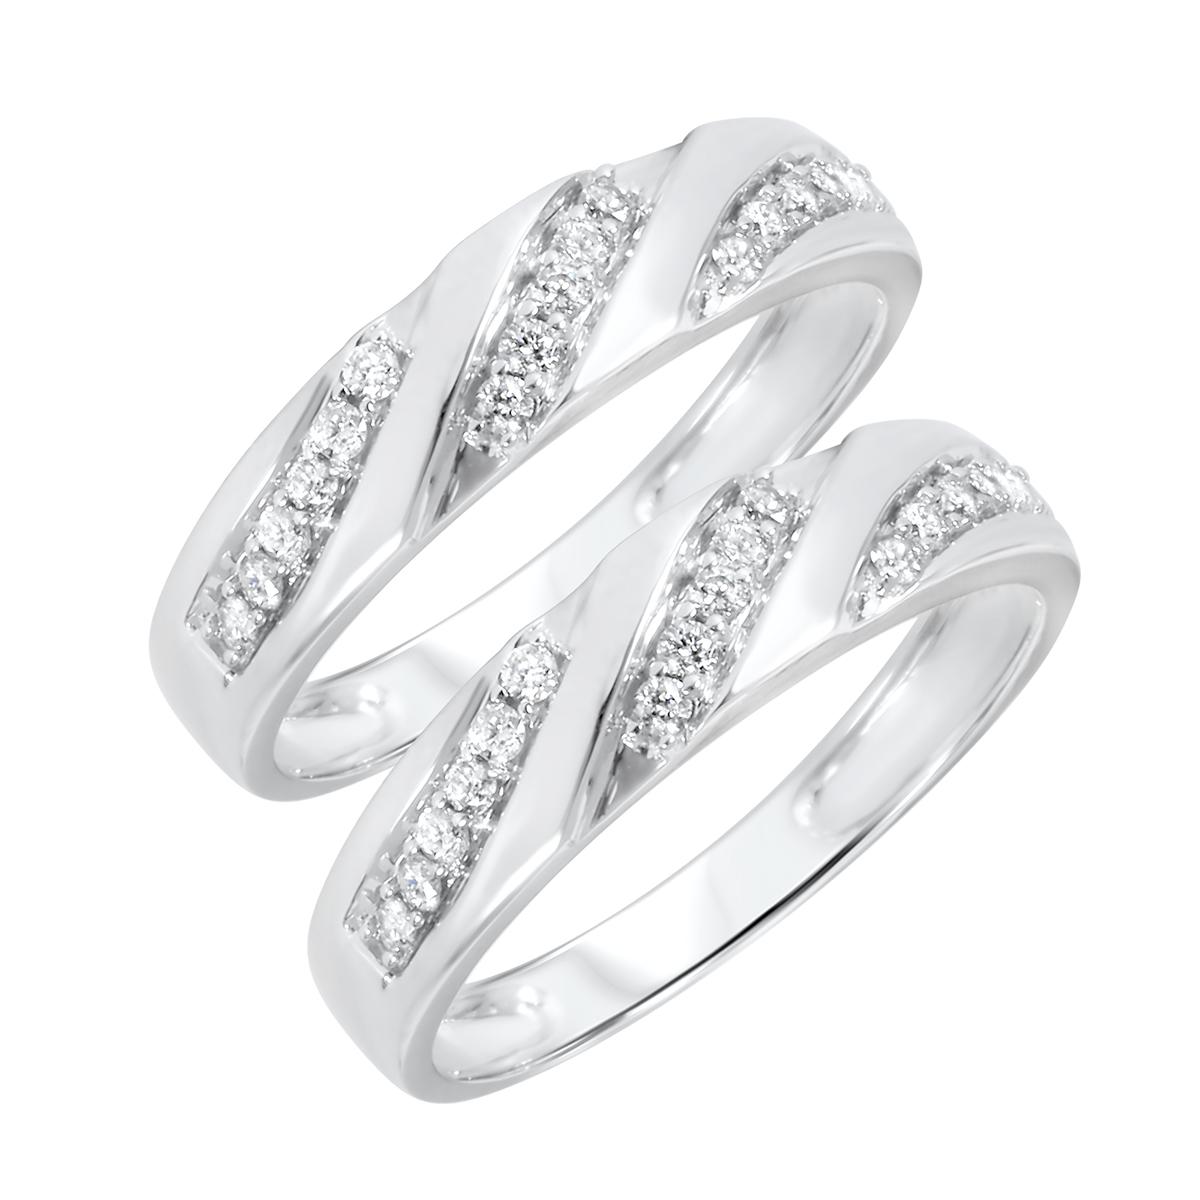 1/2 Carat T.W. Round Cut Mens  Same Sex Wedding Band Set 14K White Gold- Size 8